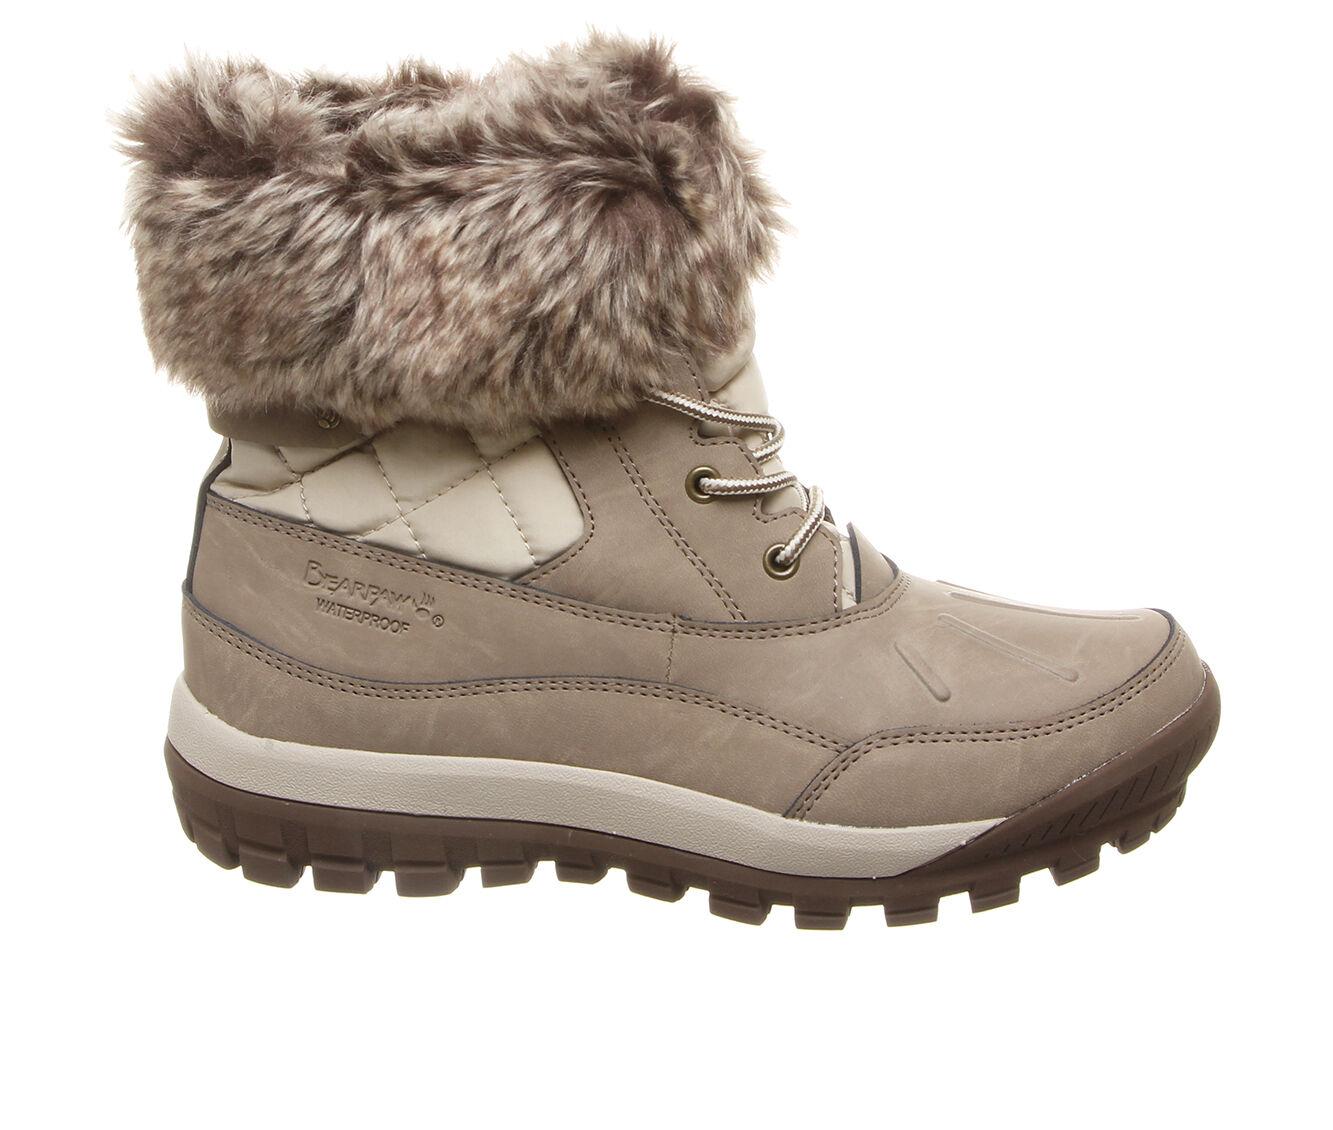 autumn styles Women's Bearpaw Becka Winter Boots Stone